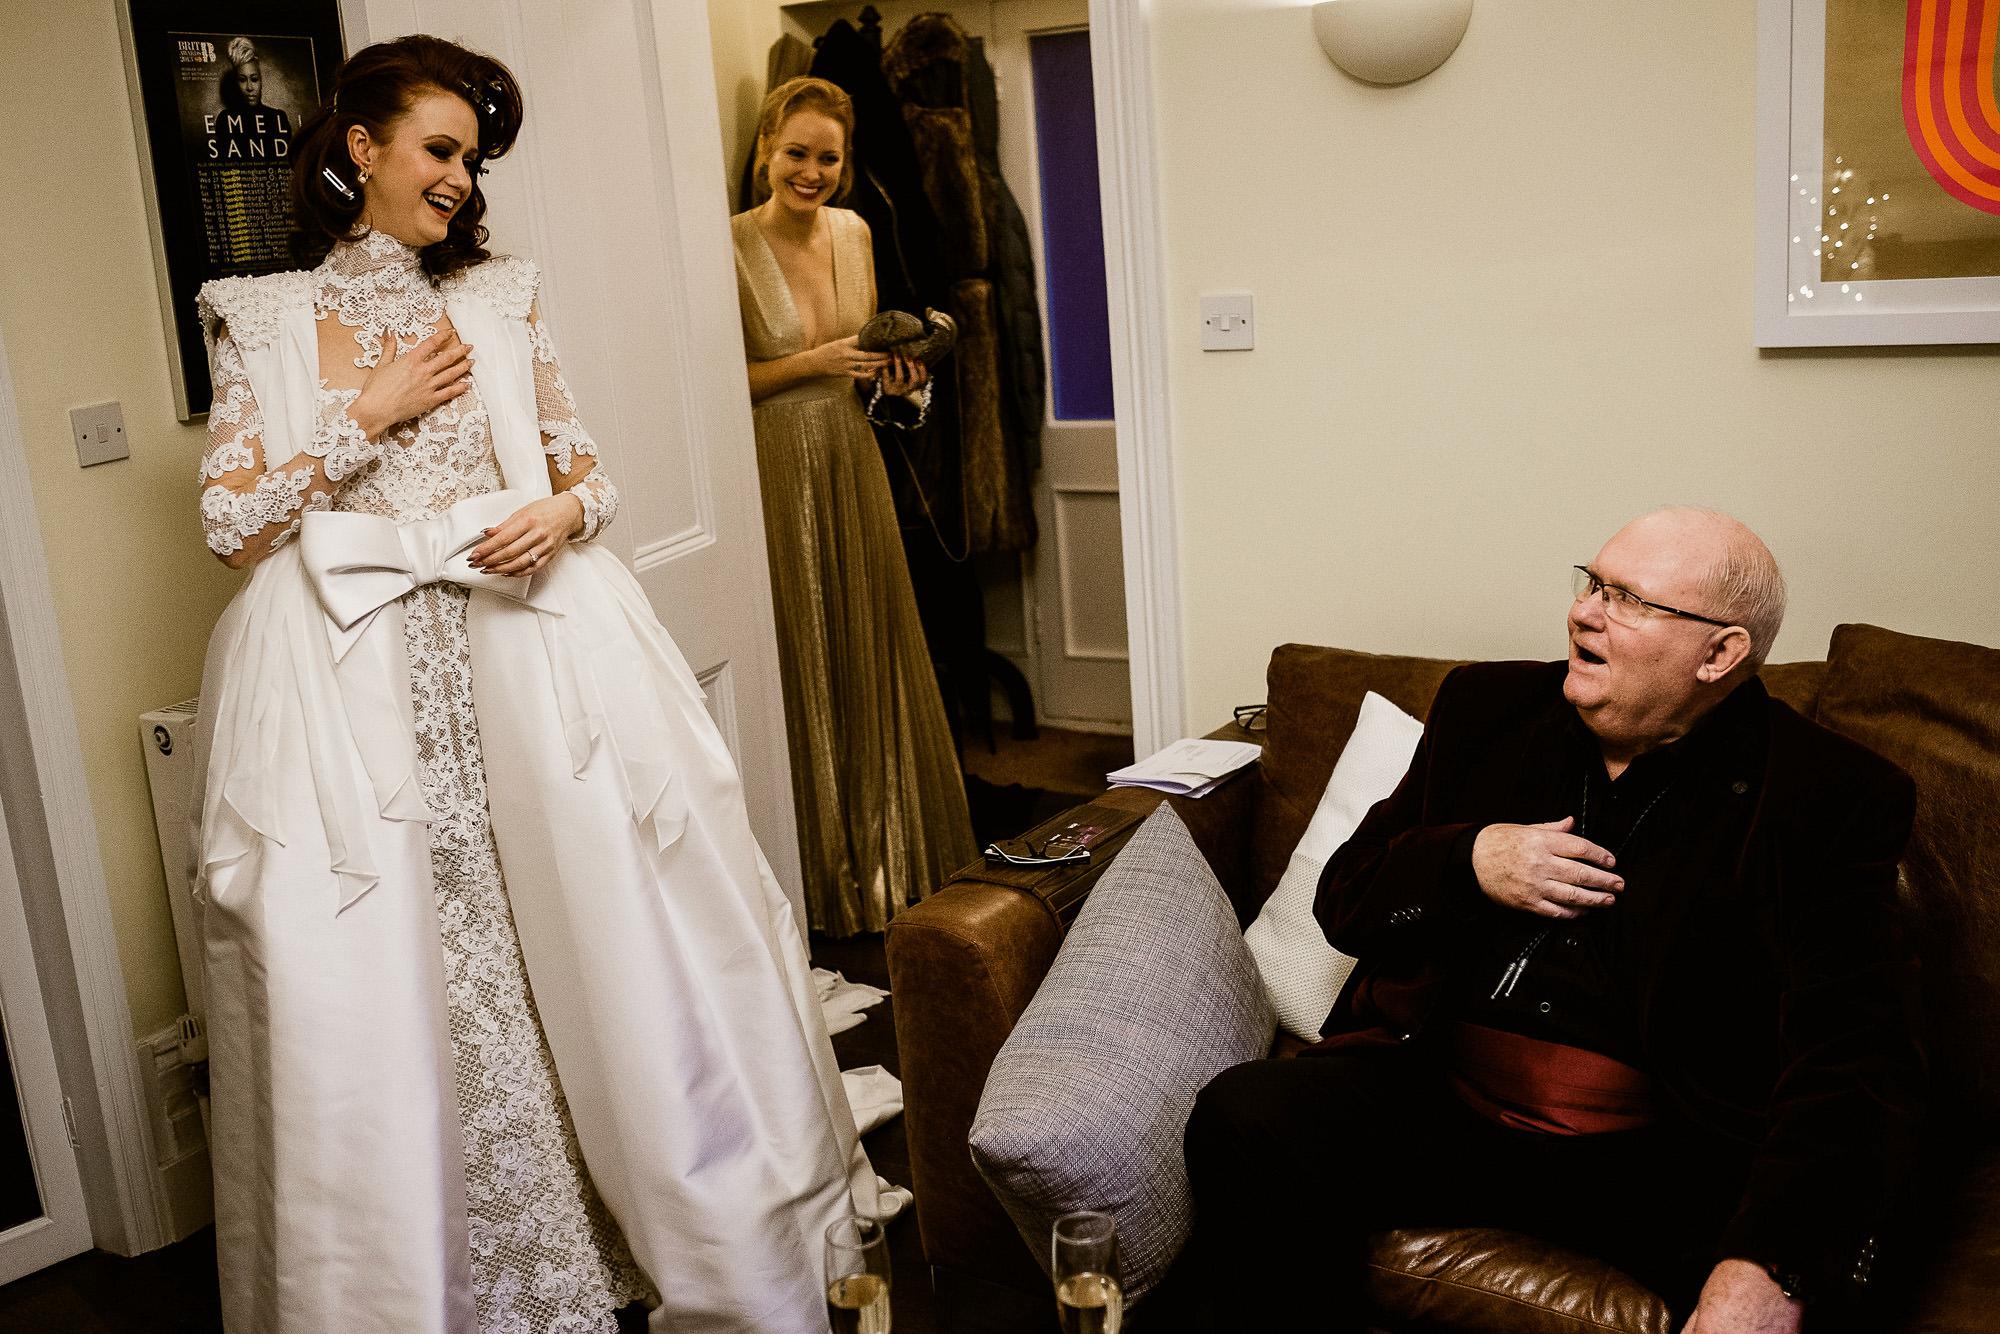 white wedding dress, shoulder pads